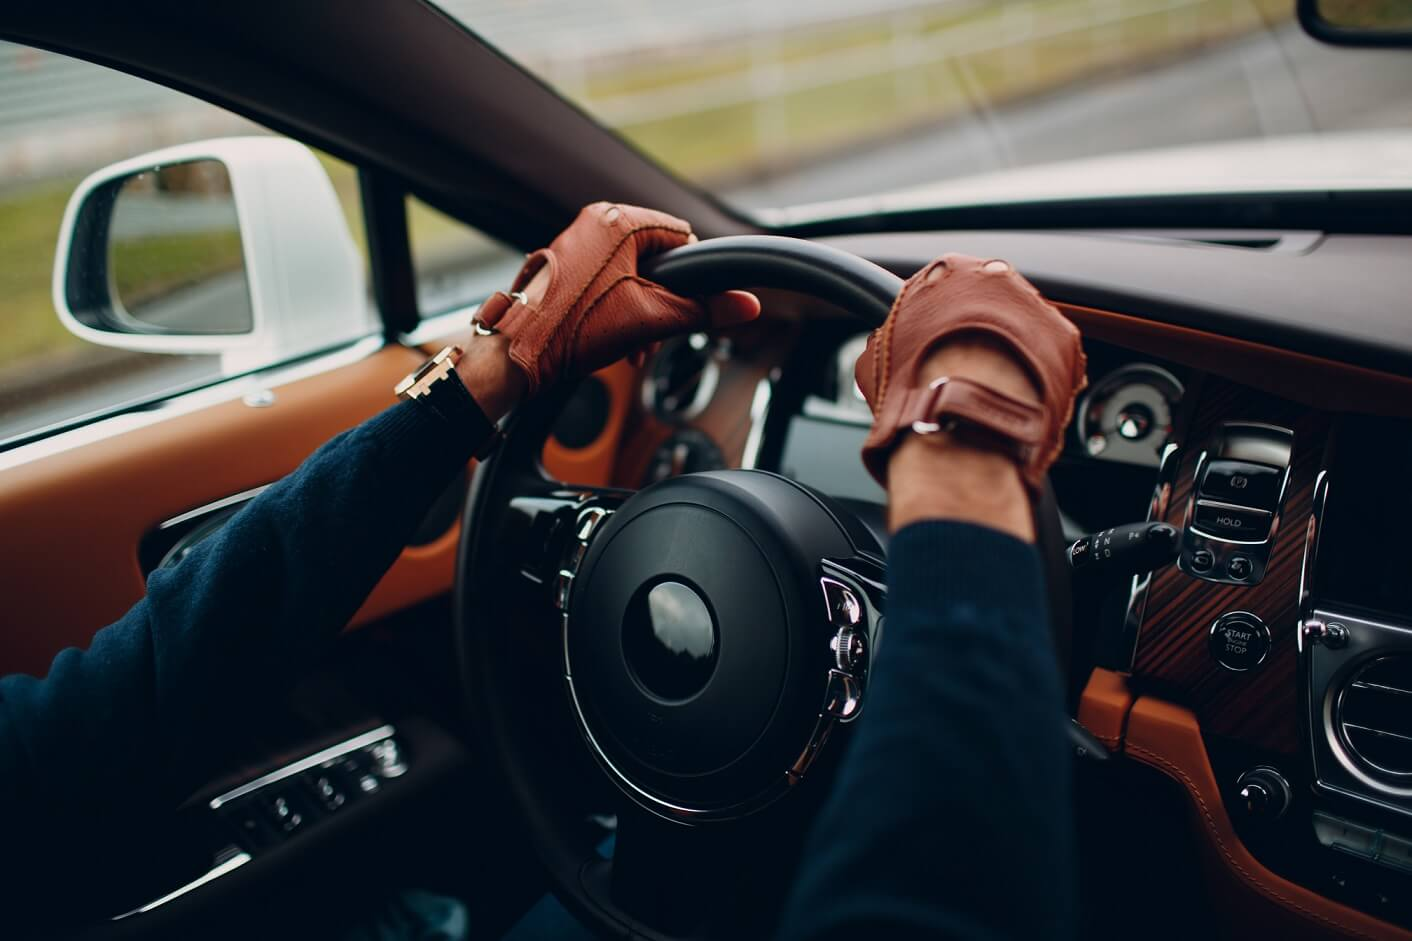 ridickske-rukavice-do-auta-stylove